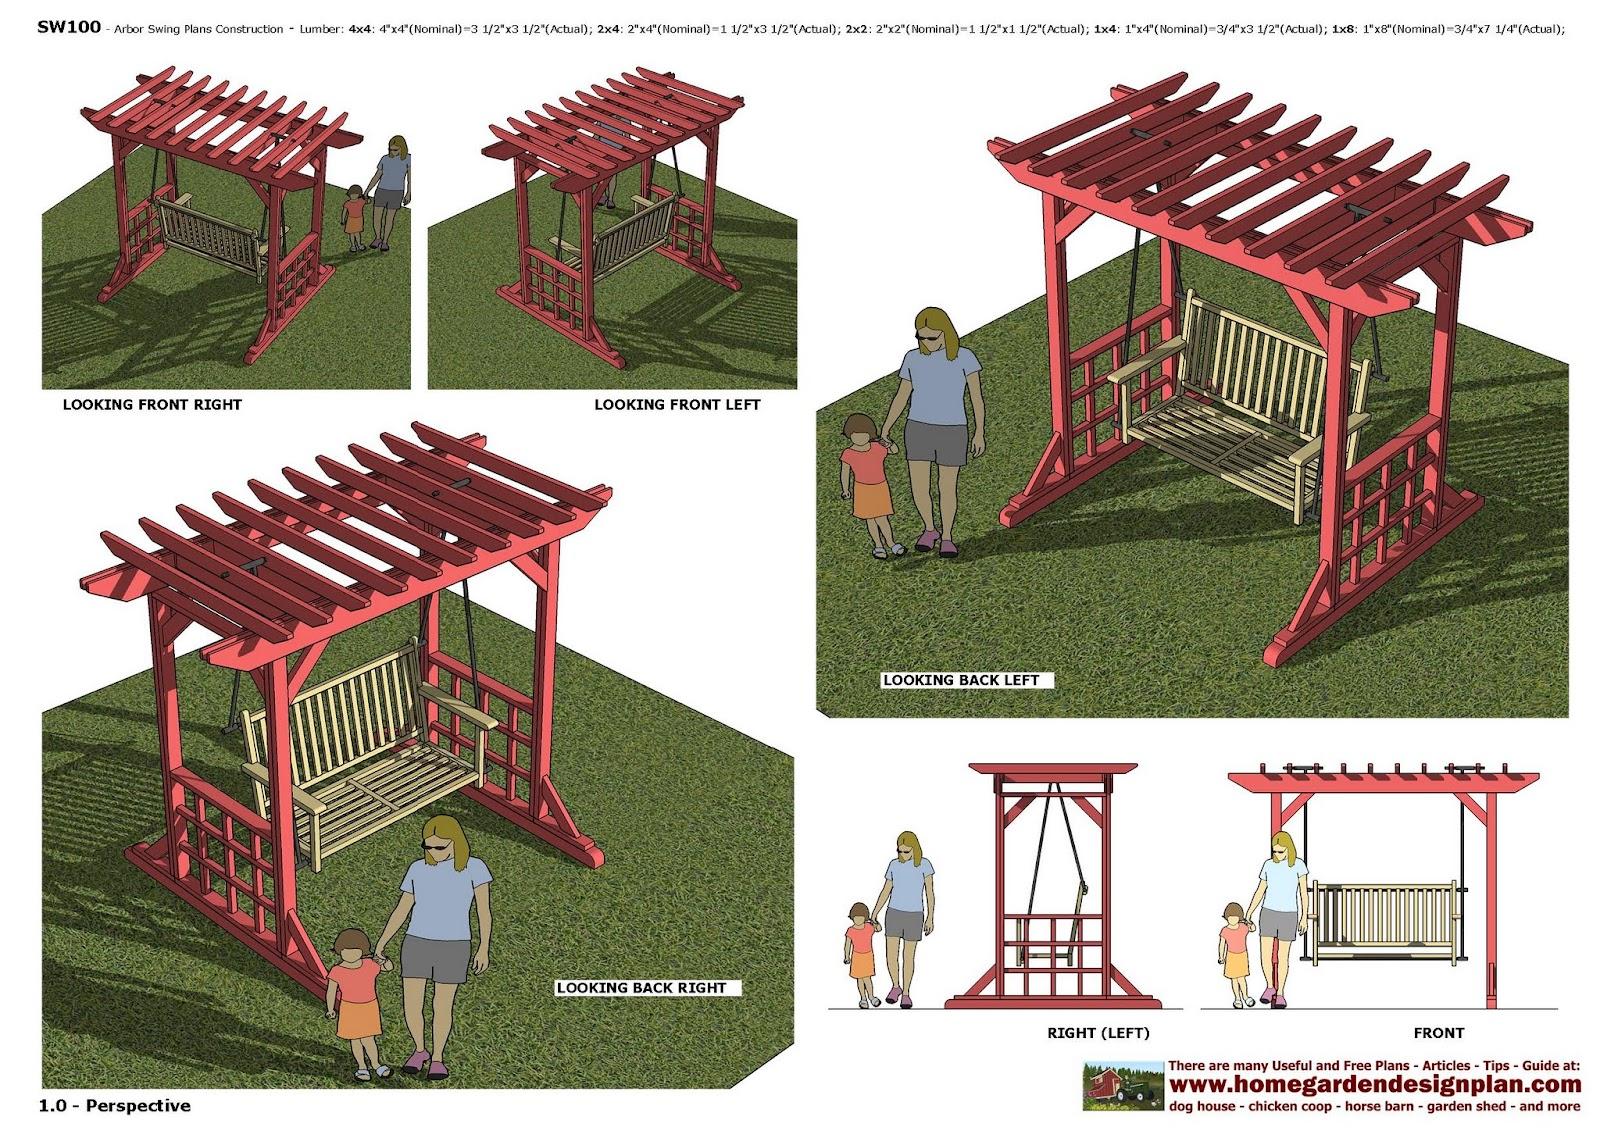 home garden plans Furniture Plans Arbor Swing Plans